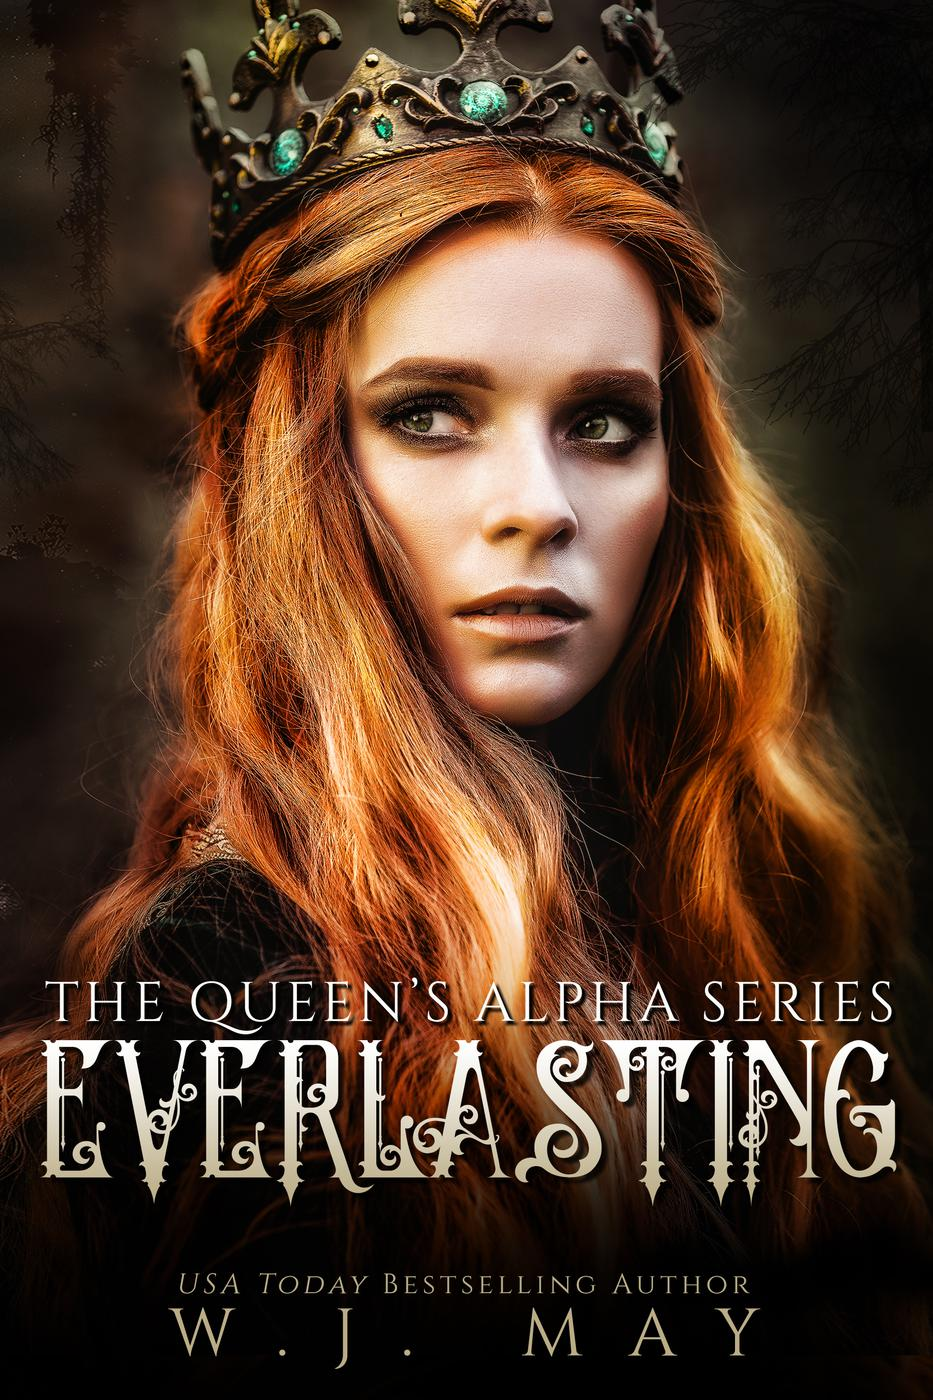 Everlasting (The Queen's Alpha Series, #2)